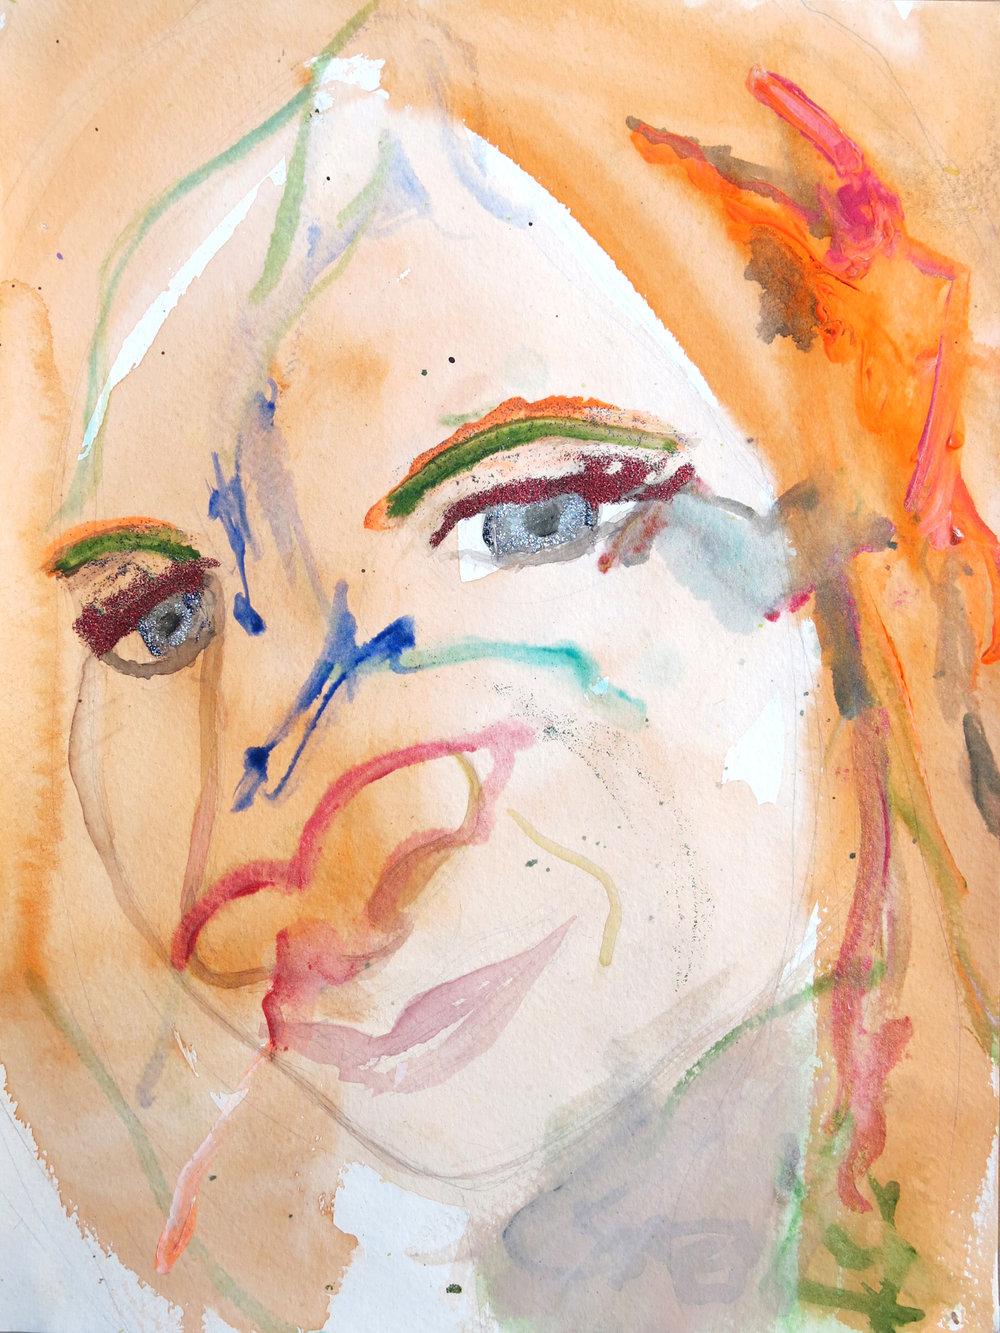 Barbra Streisand Portrait #149